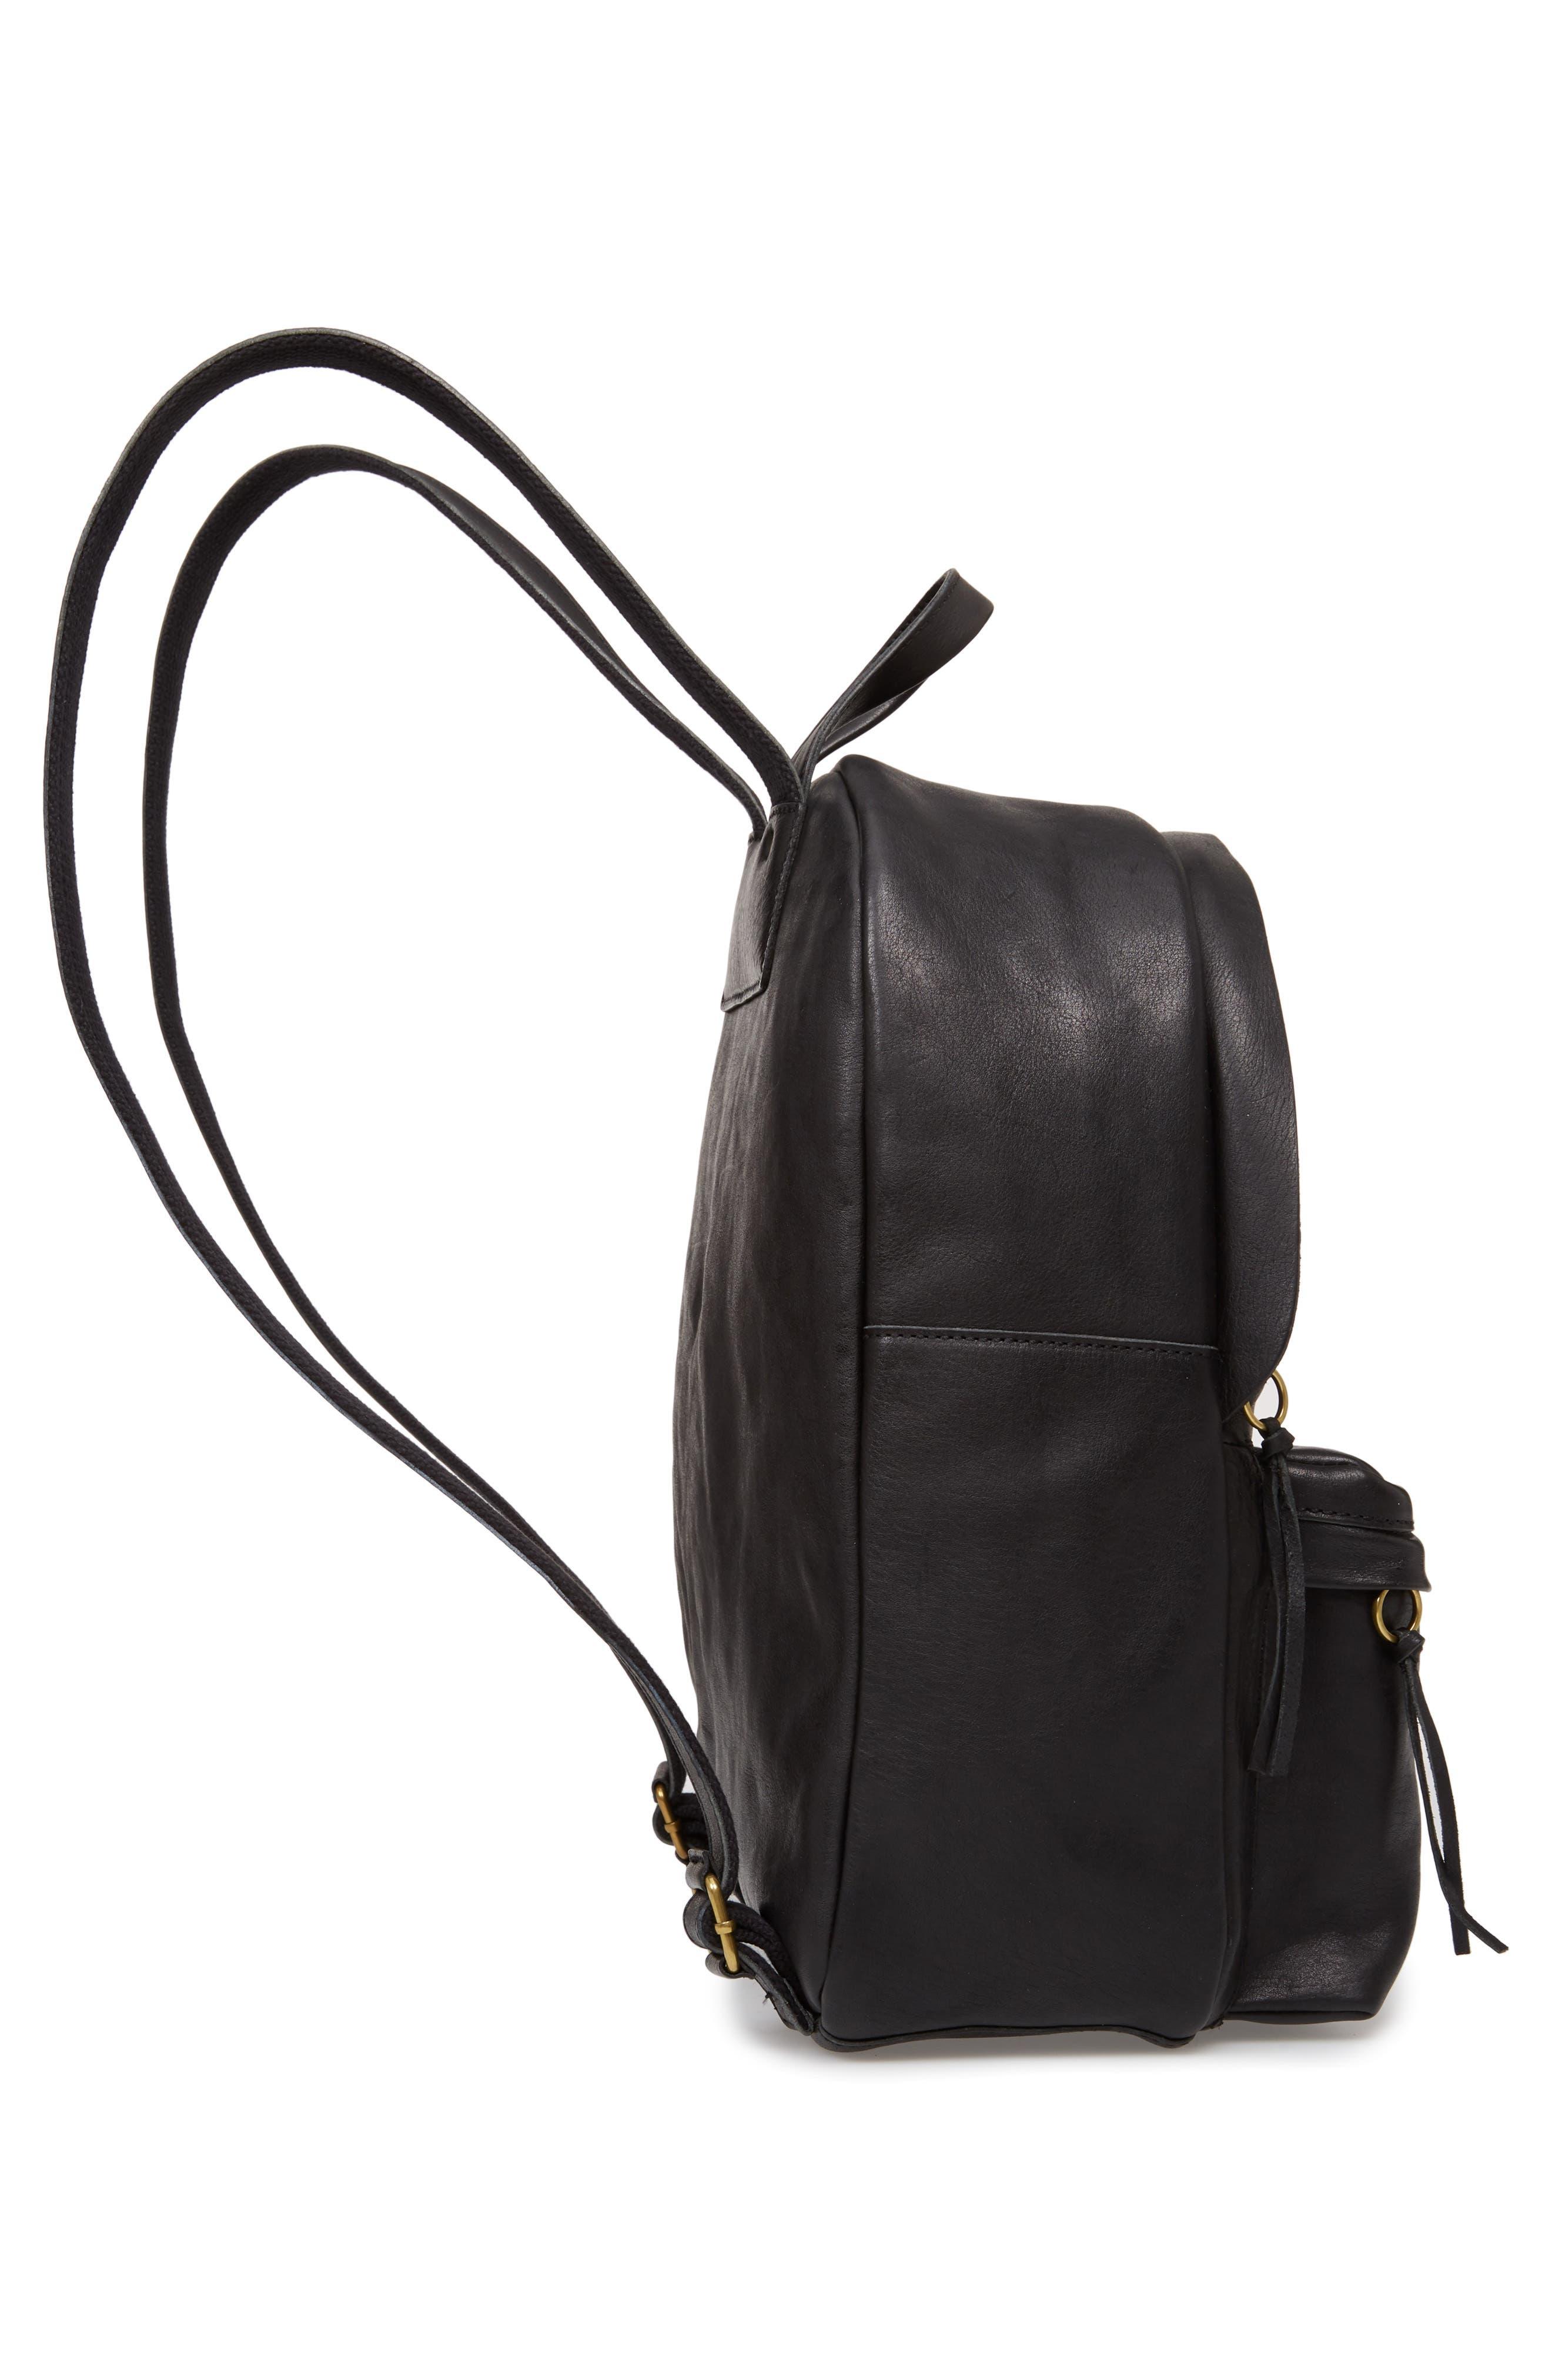 MADEWELL, Lorimer Leather Backpack, Alternate thumbnail 6, color, TRUE BLACK